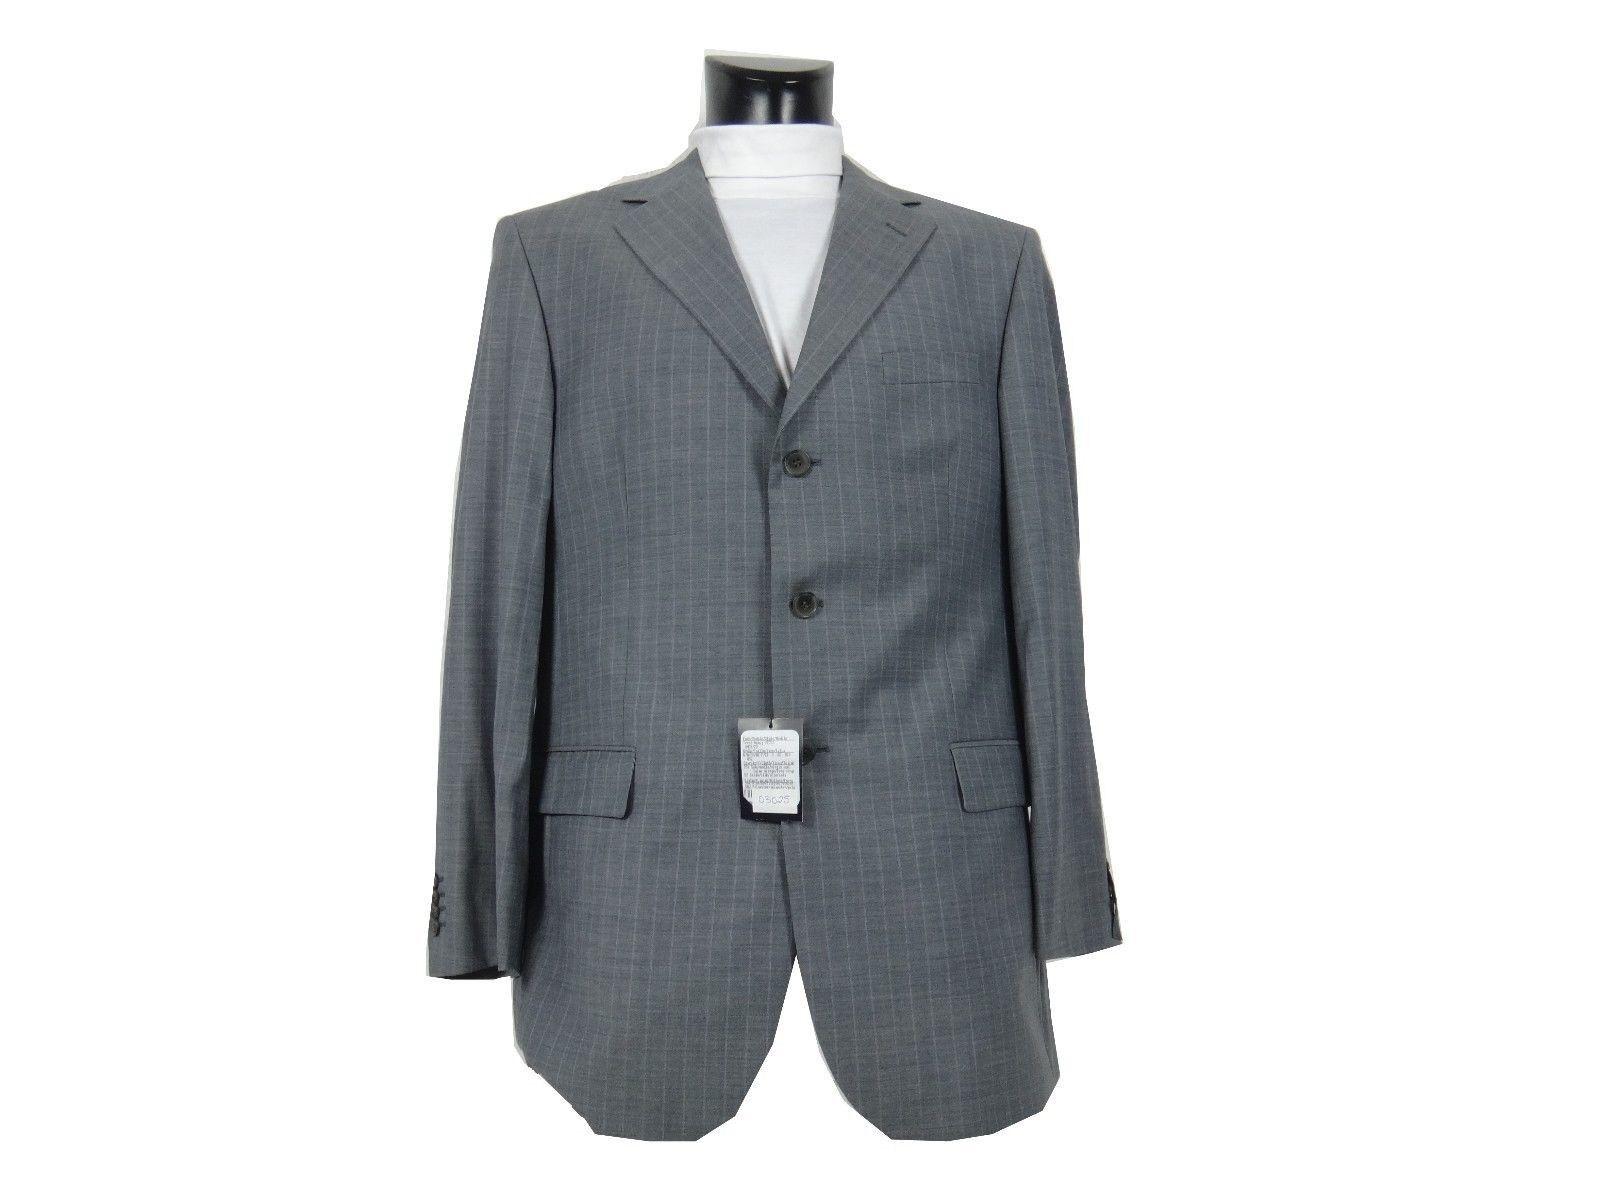 Z03025 DANIEL HECHTER Designer Trend Anzug - Gr. 52 - grau Nadelstreifen - Neu